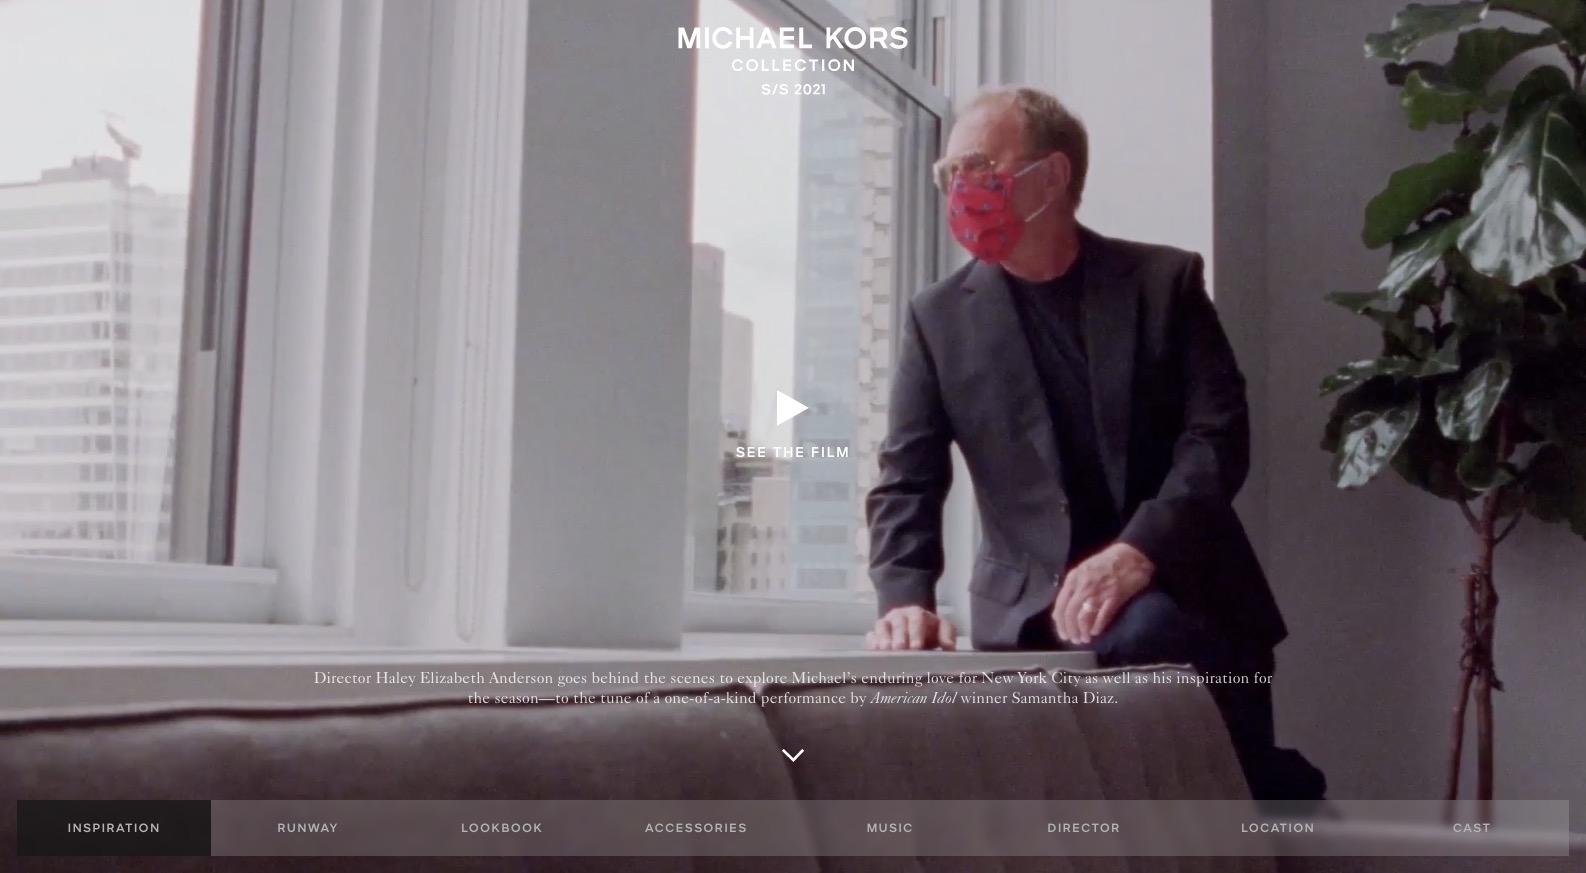 screenshot of michael kors' collection page